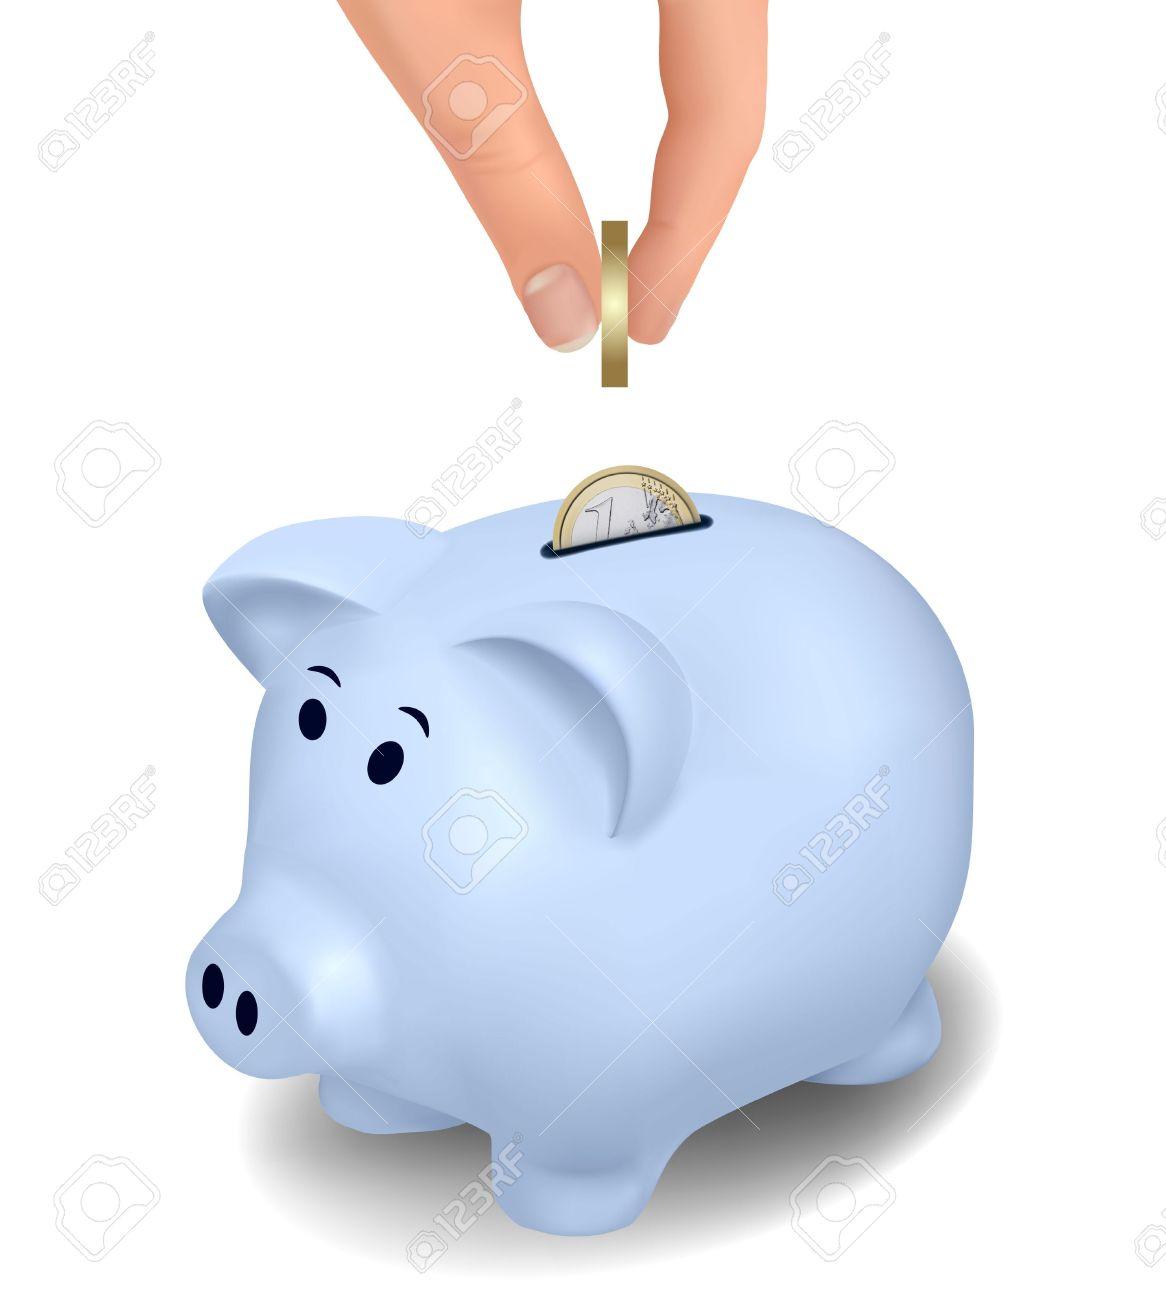 Blue piggy bank clipart jpg transparent stock Euro Coins Falling Into Piggy Bank. Vector. Royalty Free Cliparts ... jpg transparent stock